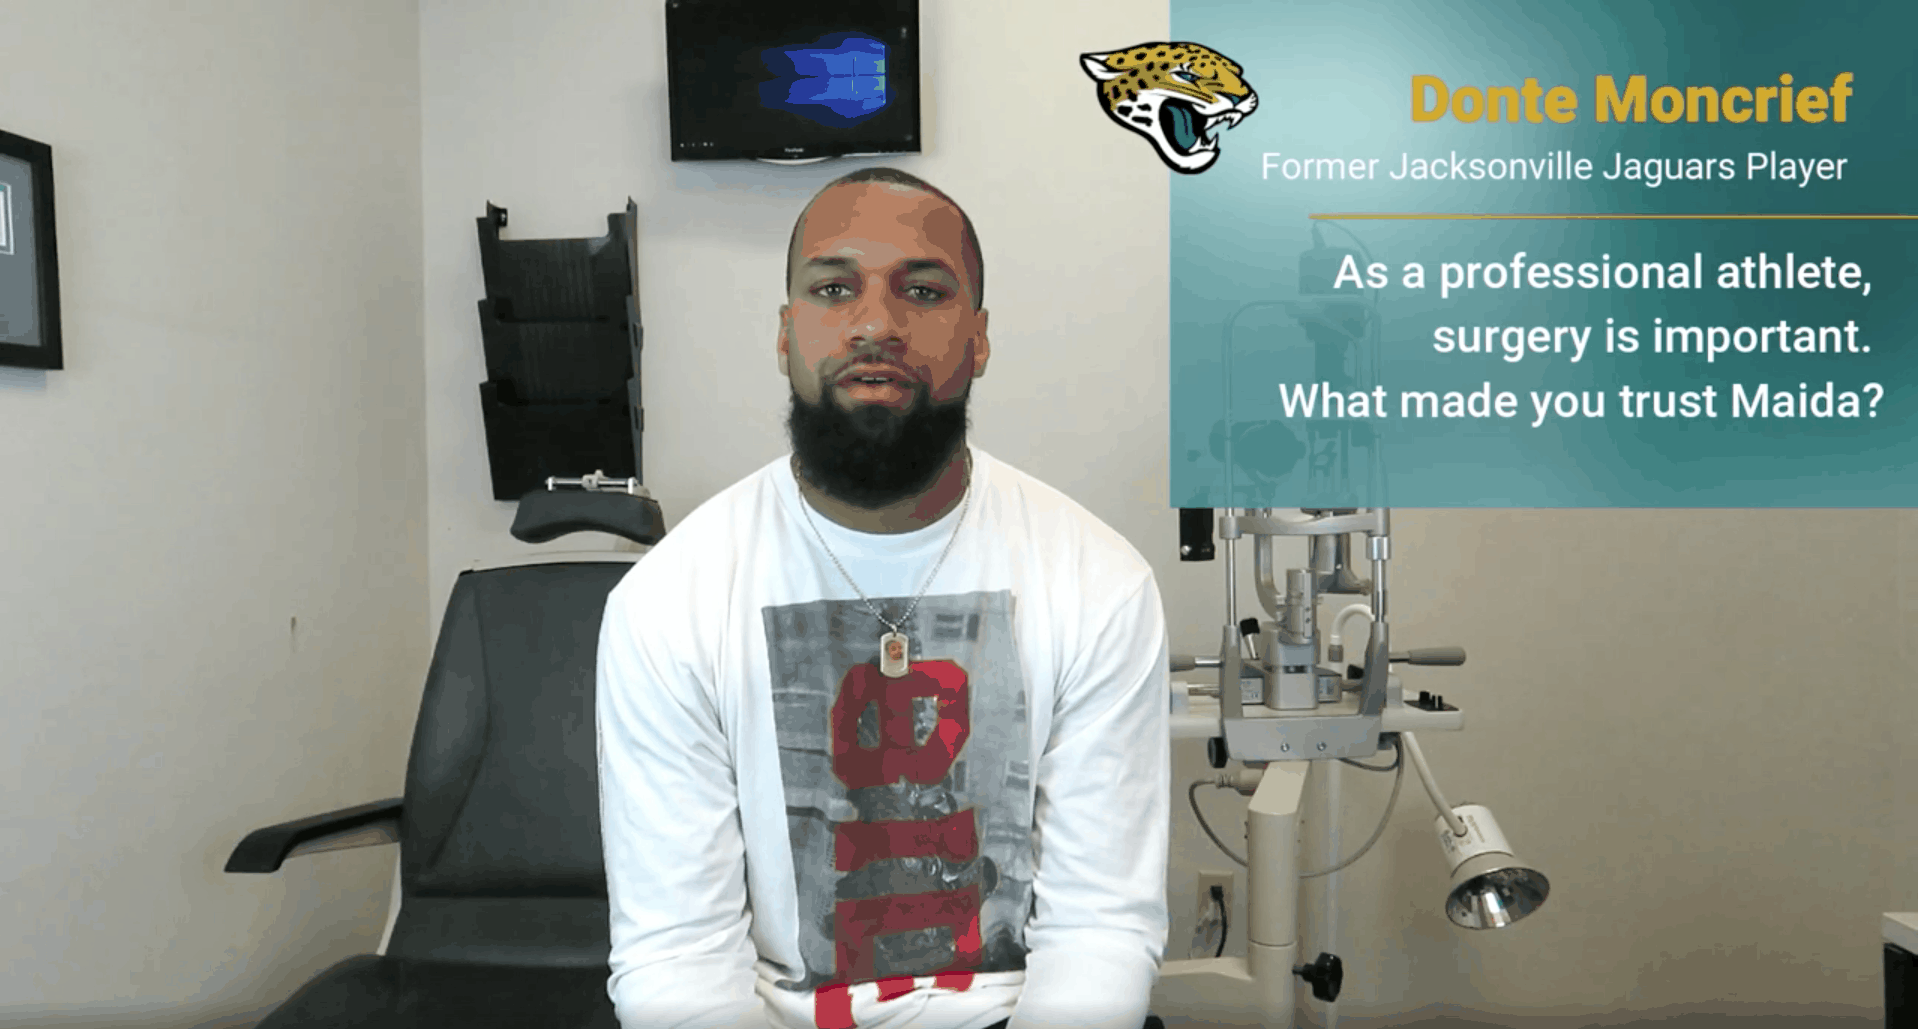 Jacksonville Jaguars Donte Moncrief Maida LASIK Testimonial